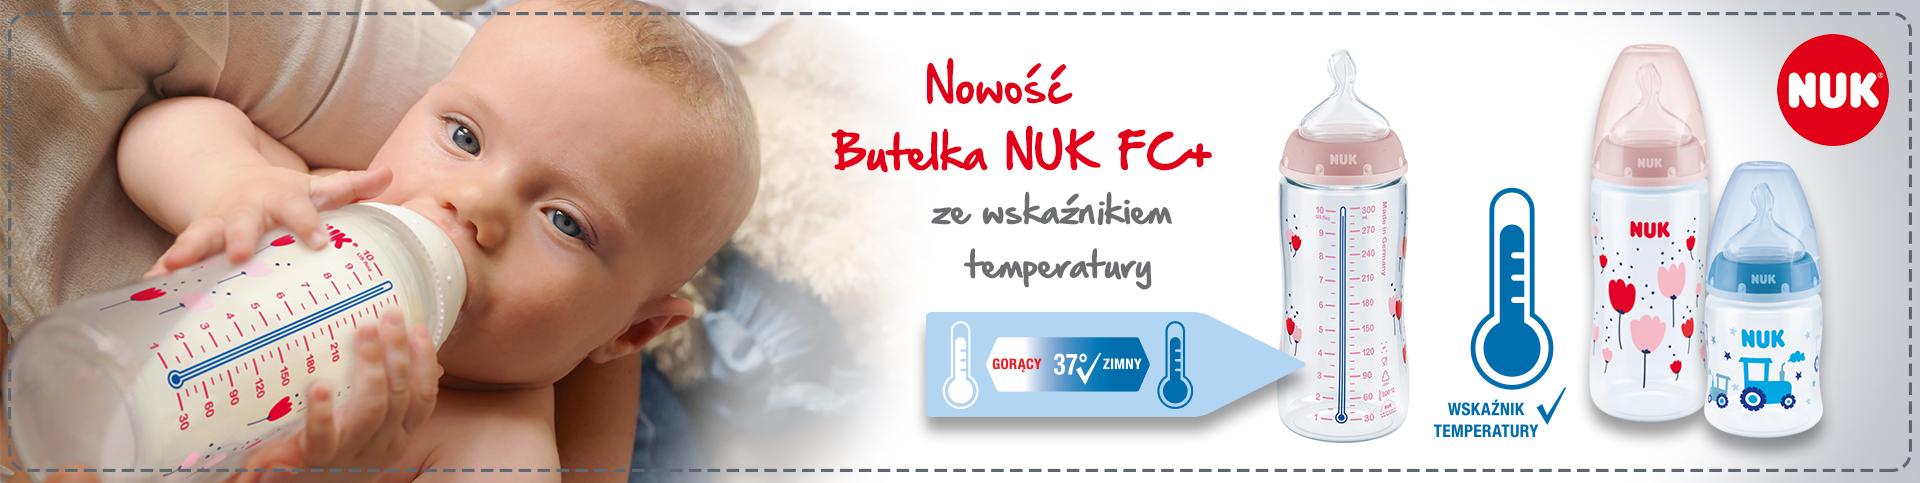 Nowość - Butelka NUK FC+ ze wskaźnikiem temperatury